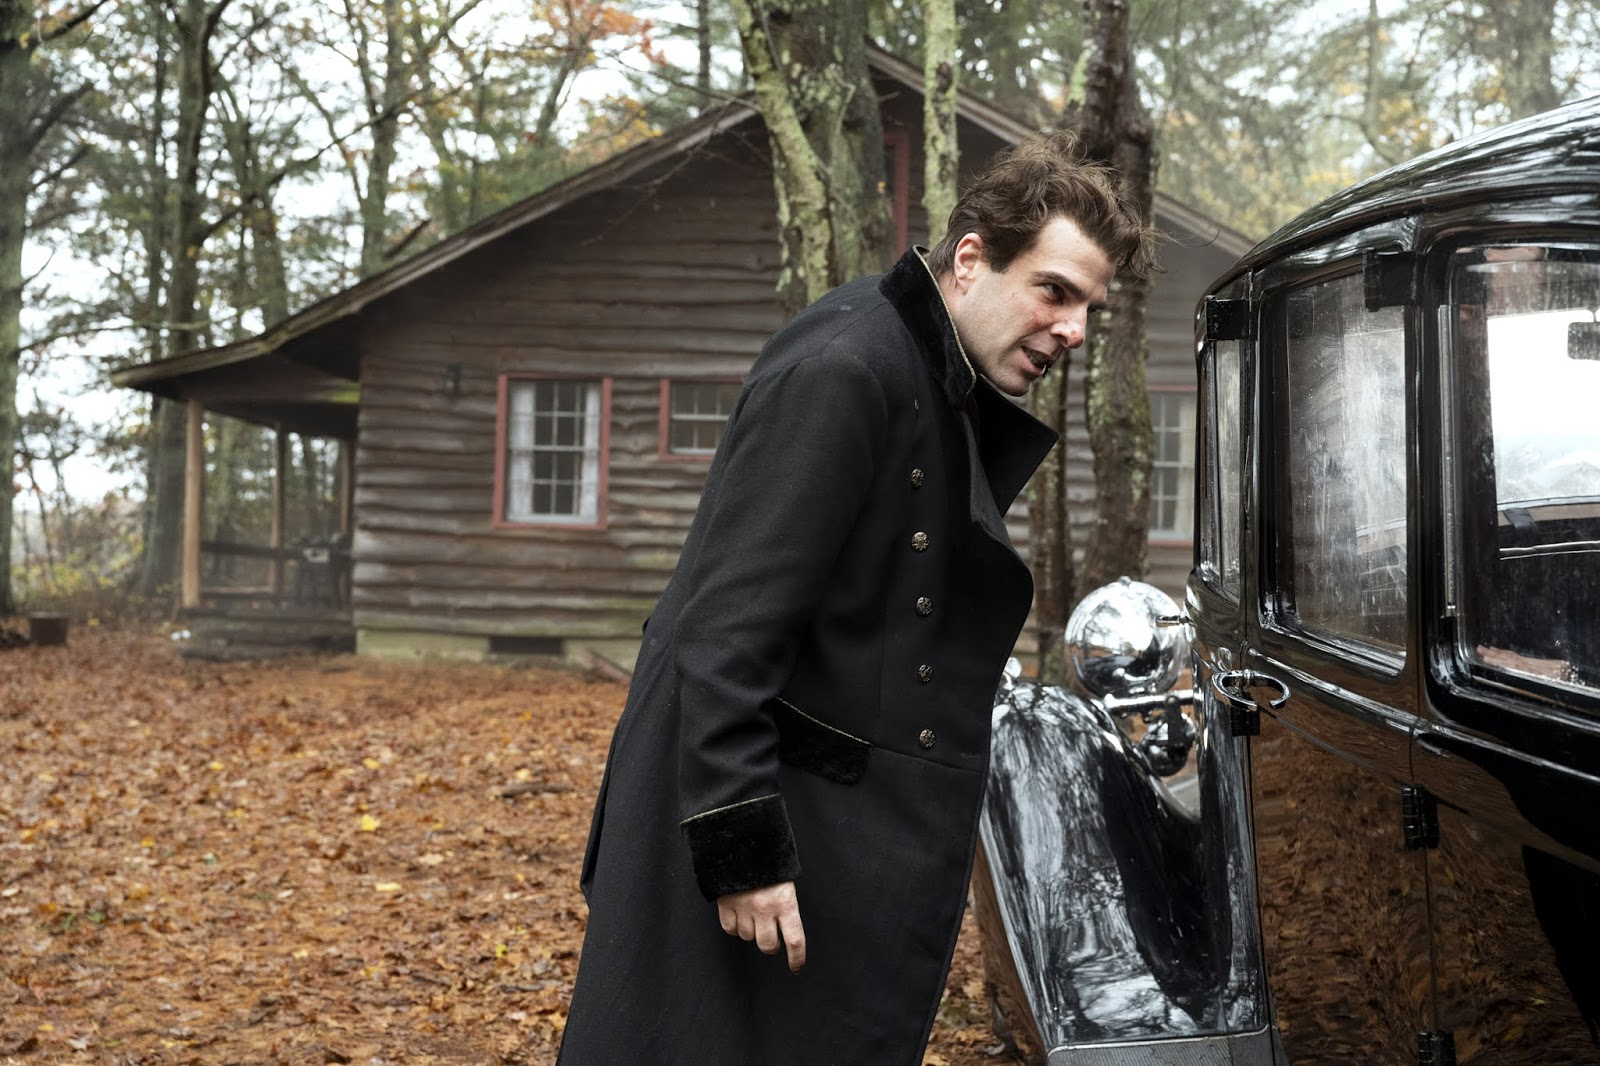 Zachary Quinto is Charlie Manx | NOS4A2 Bruce Wayne McQueen | season 2 episode 5